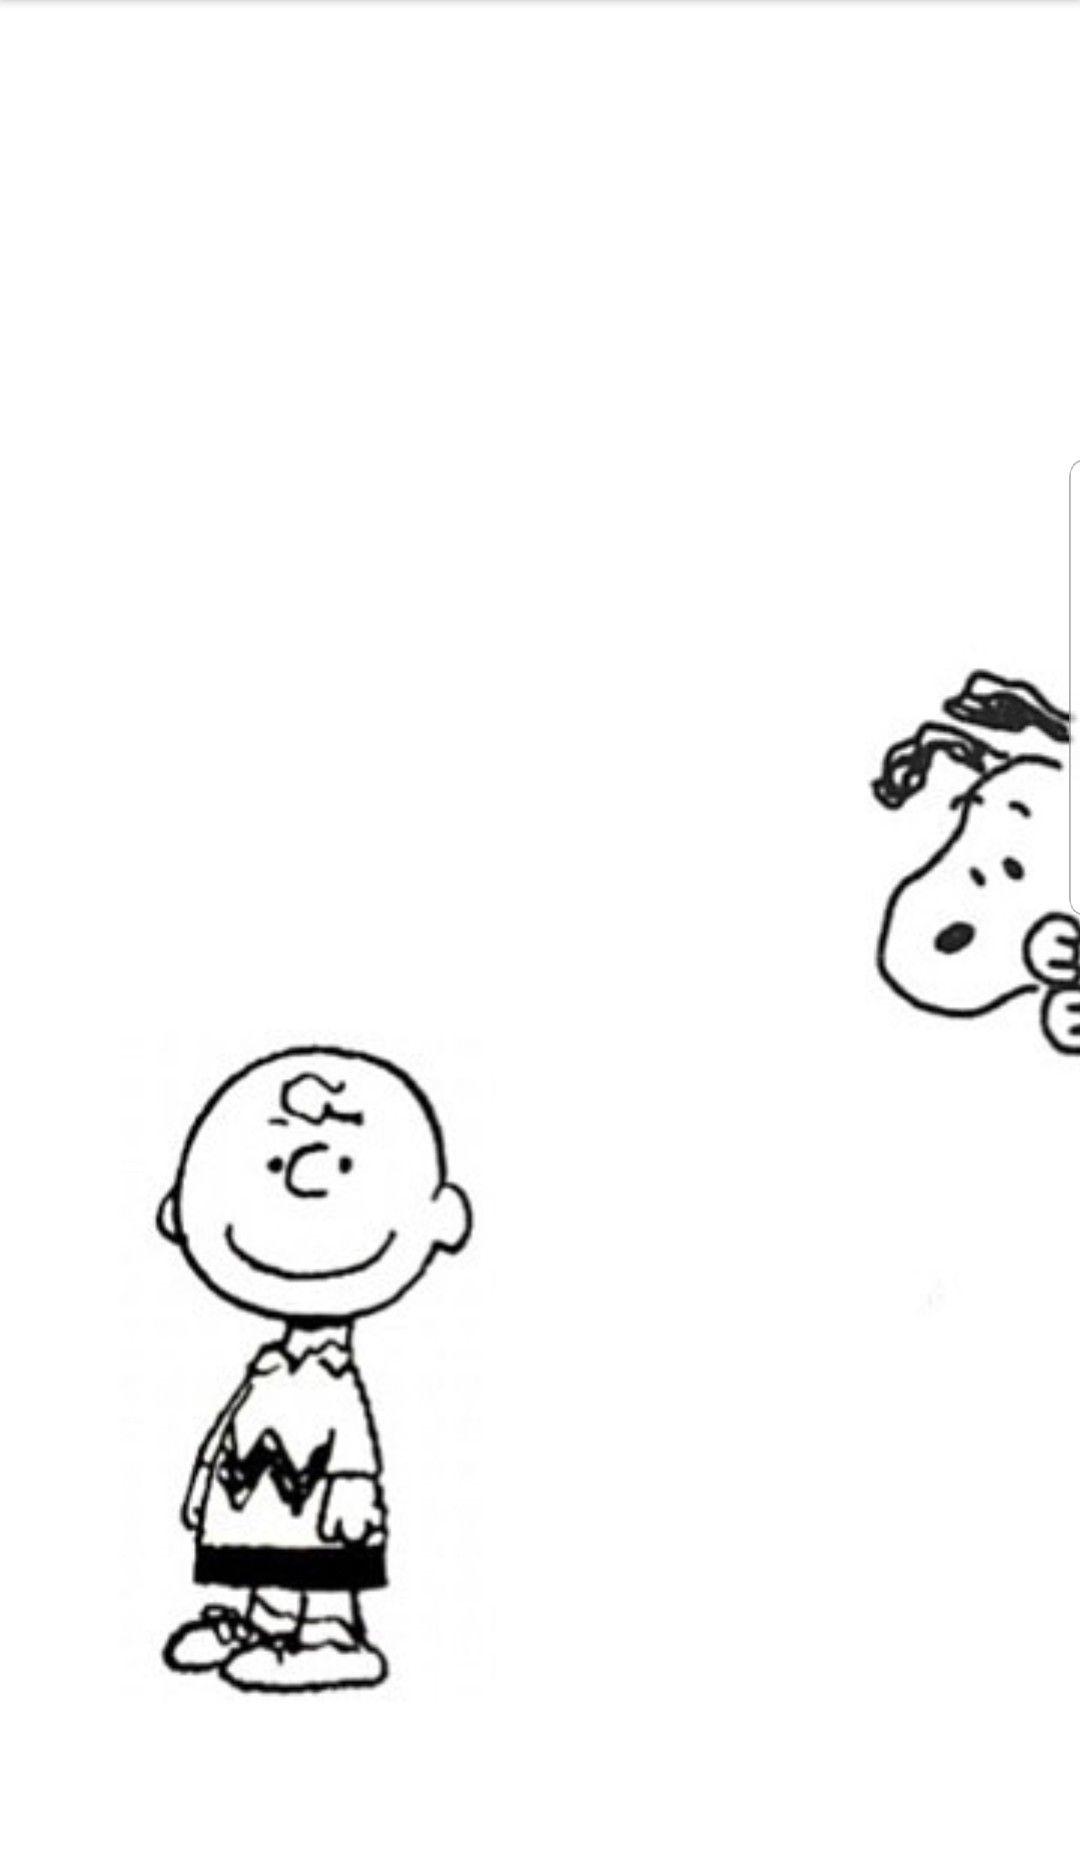 Hello Snoopy スヌーピー 愛 長場雄 スヌーピー スヌーピーの壁紙